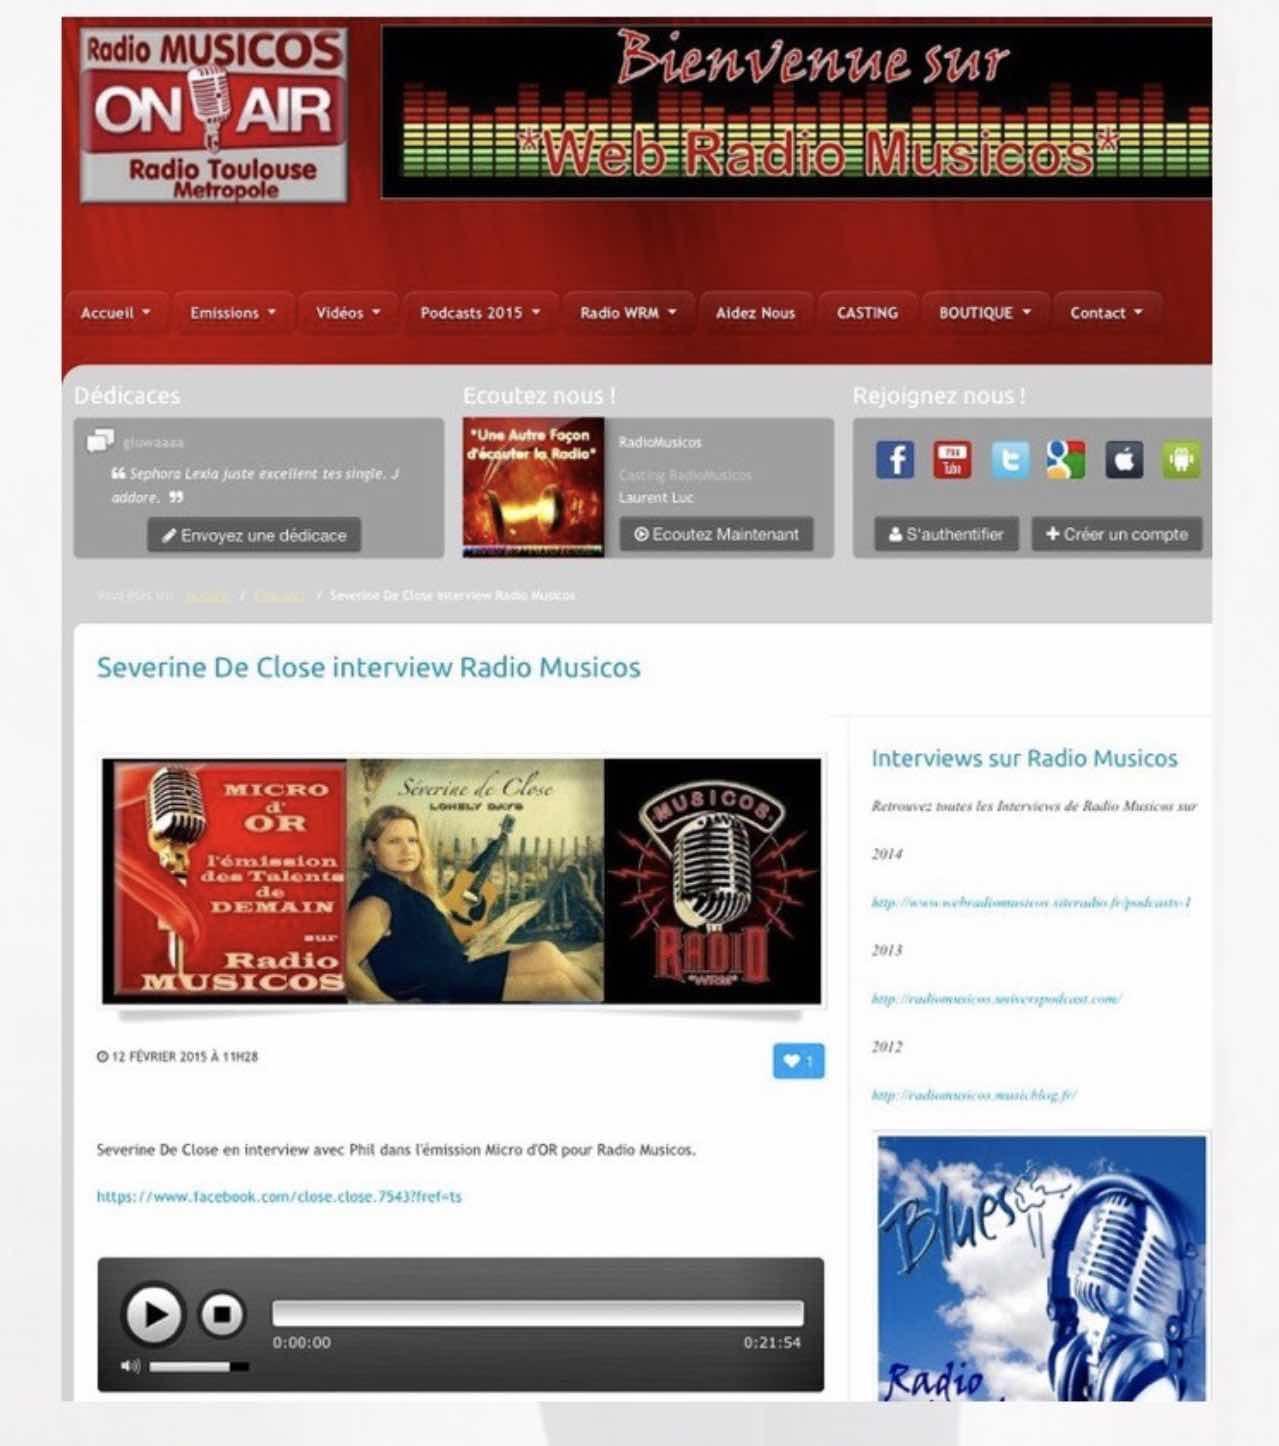 Radio Musicos - 12/02/15